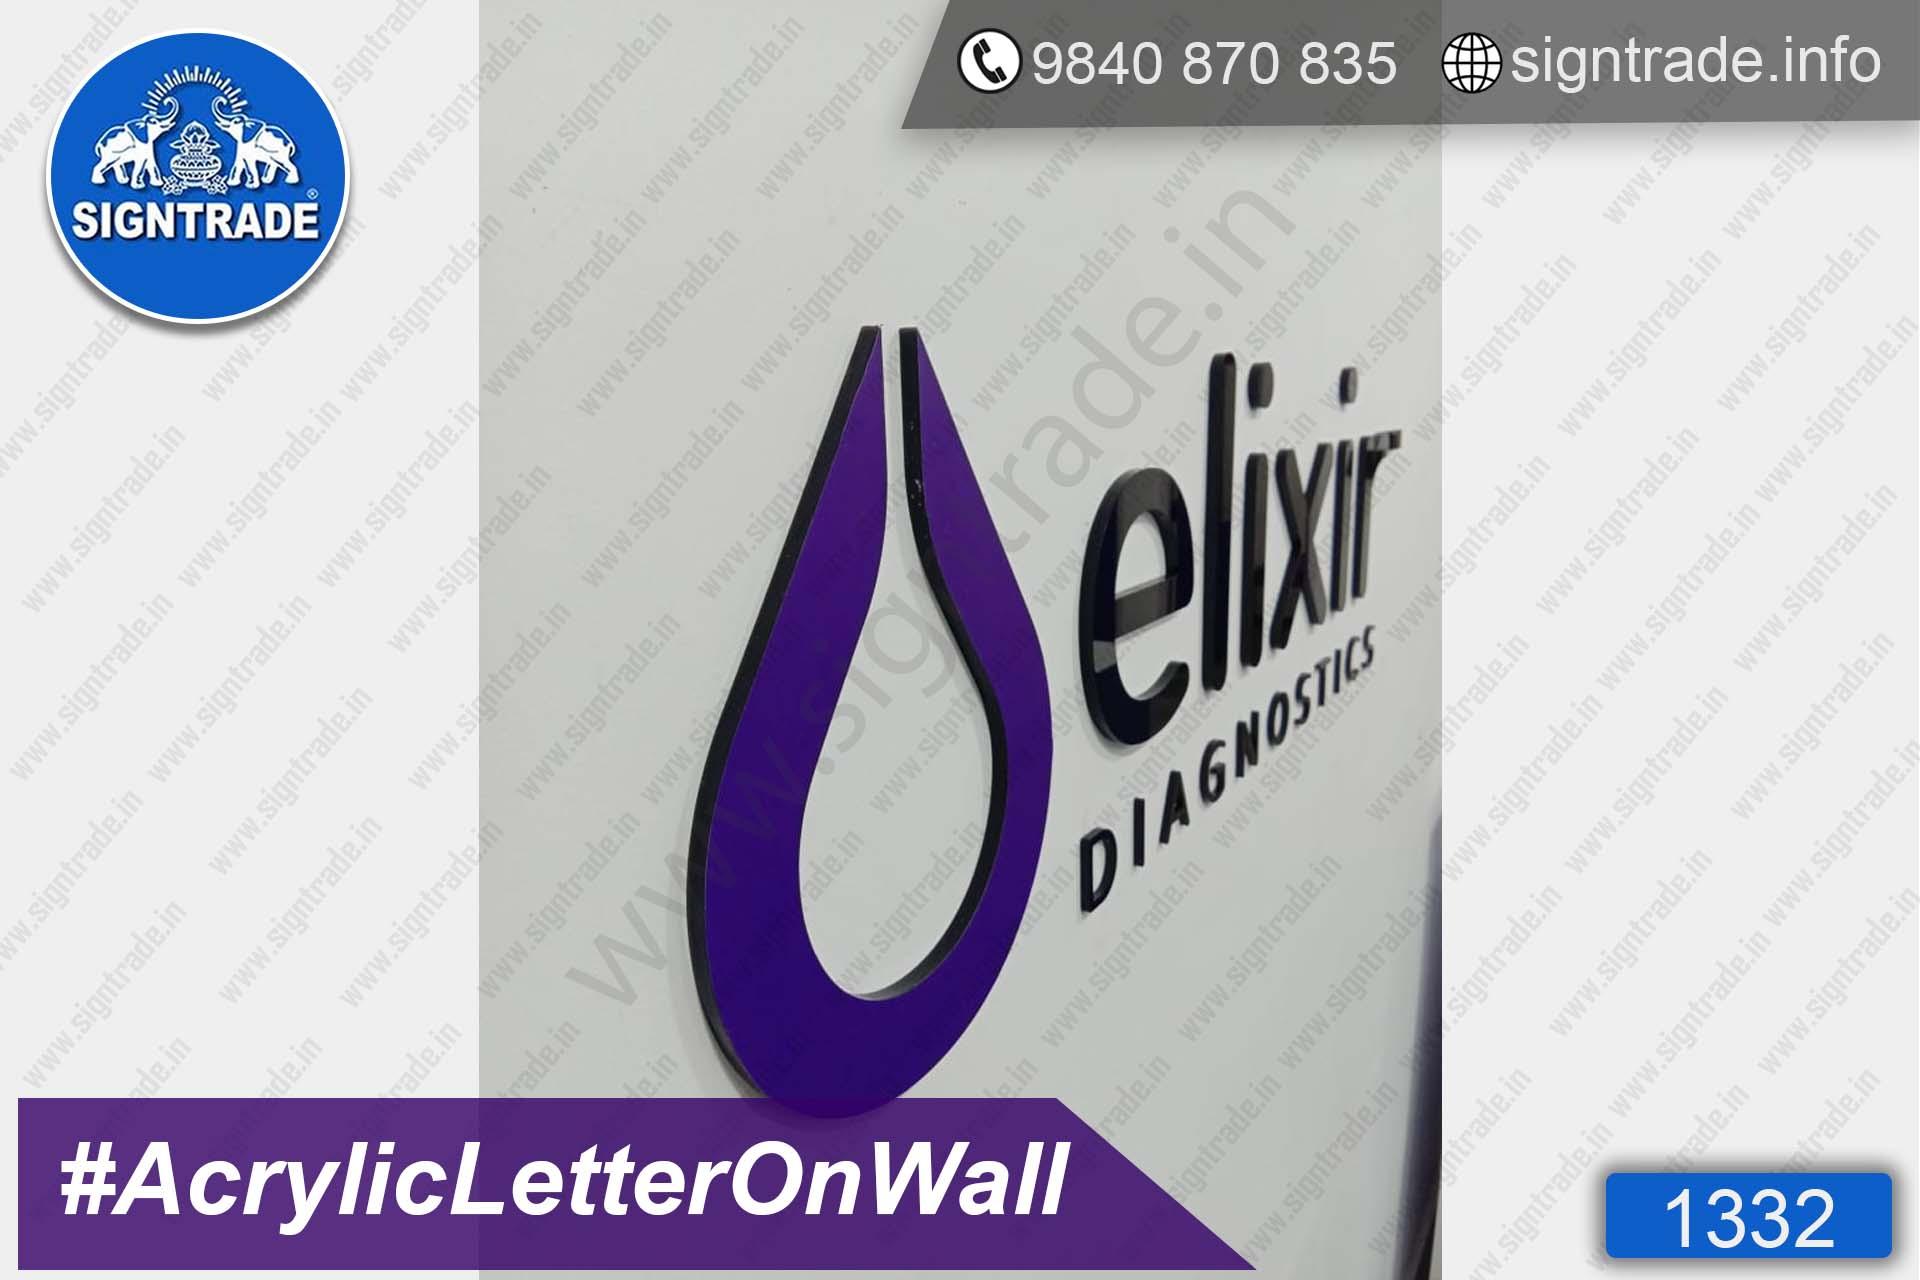 Elixir Diagnostic Centre - Anna Nagar - Chennai - SIGNTRADE - Acrylic Letter Pasted on Wall